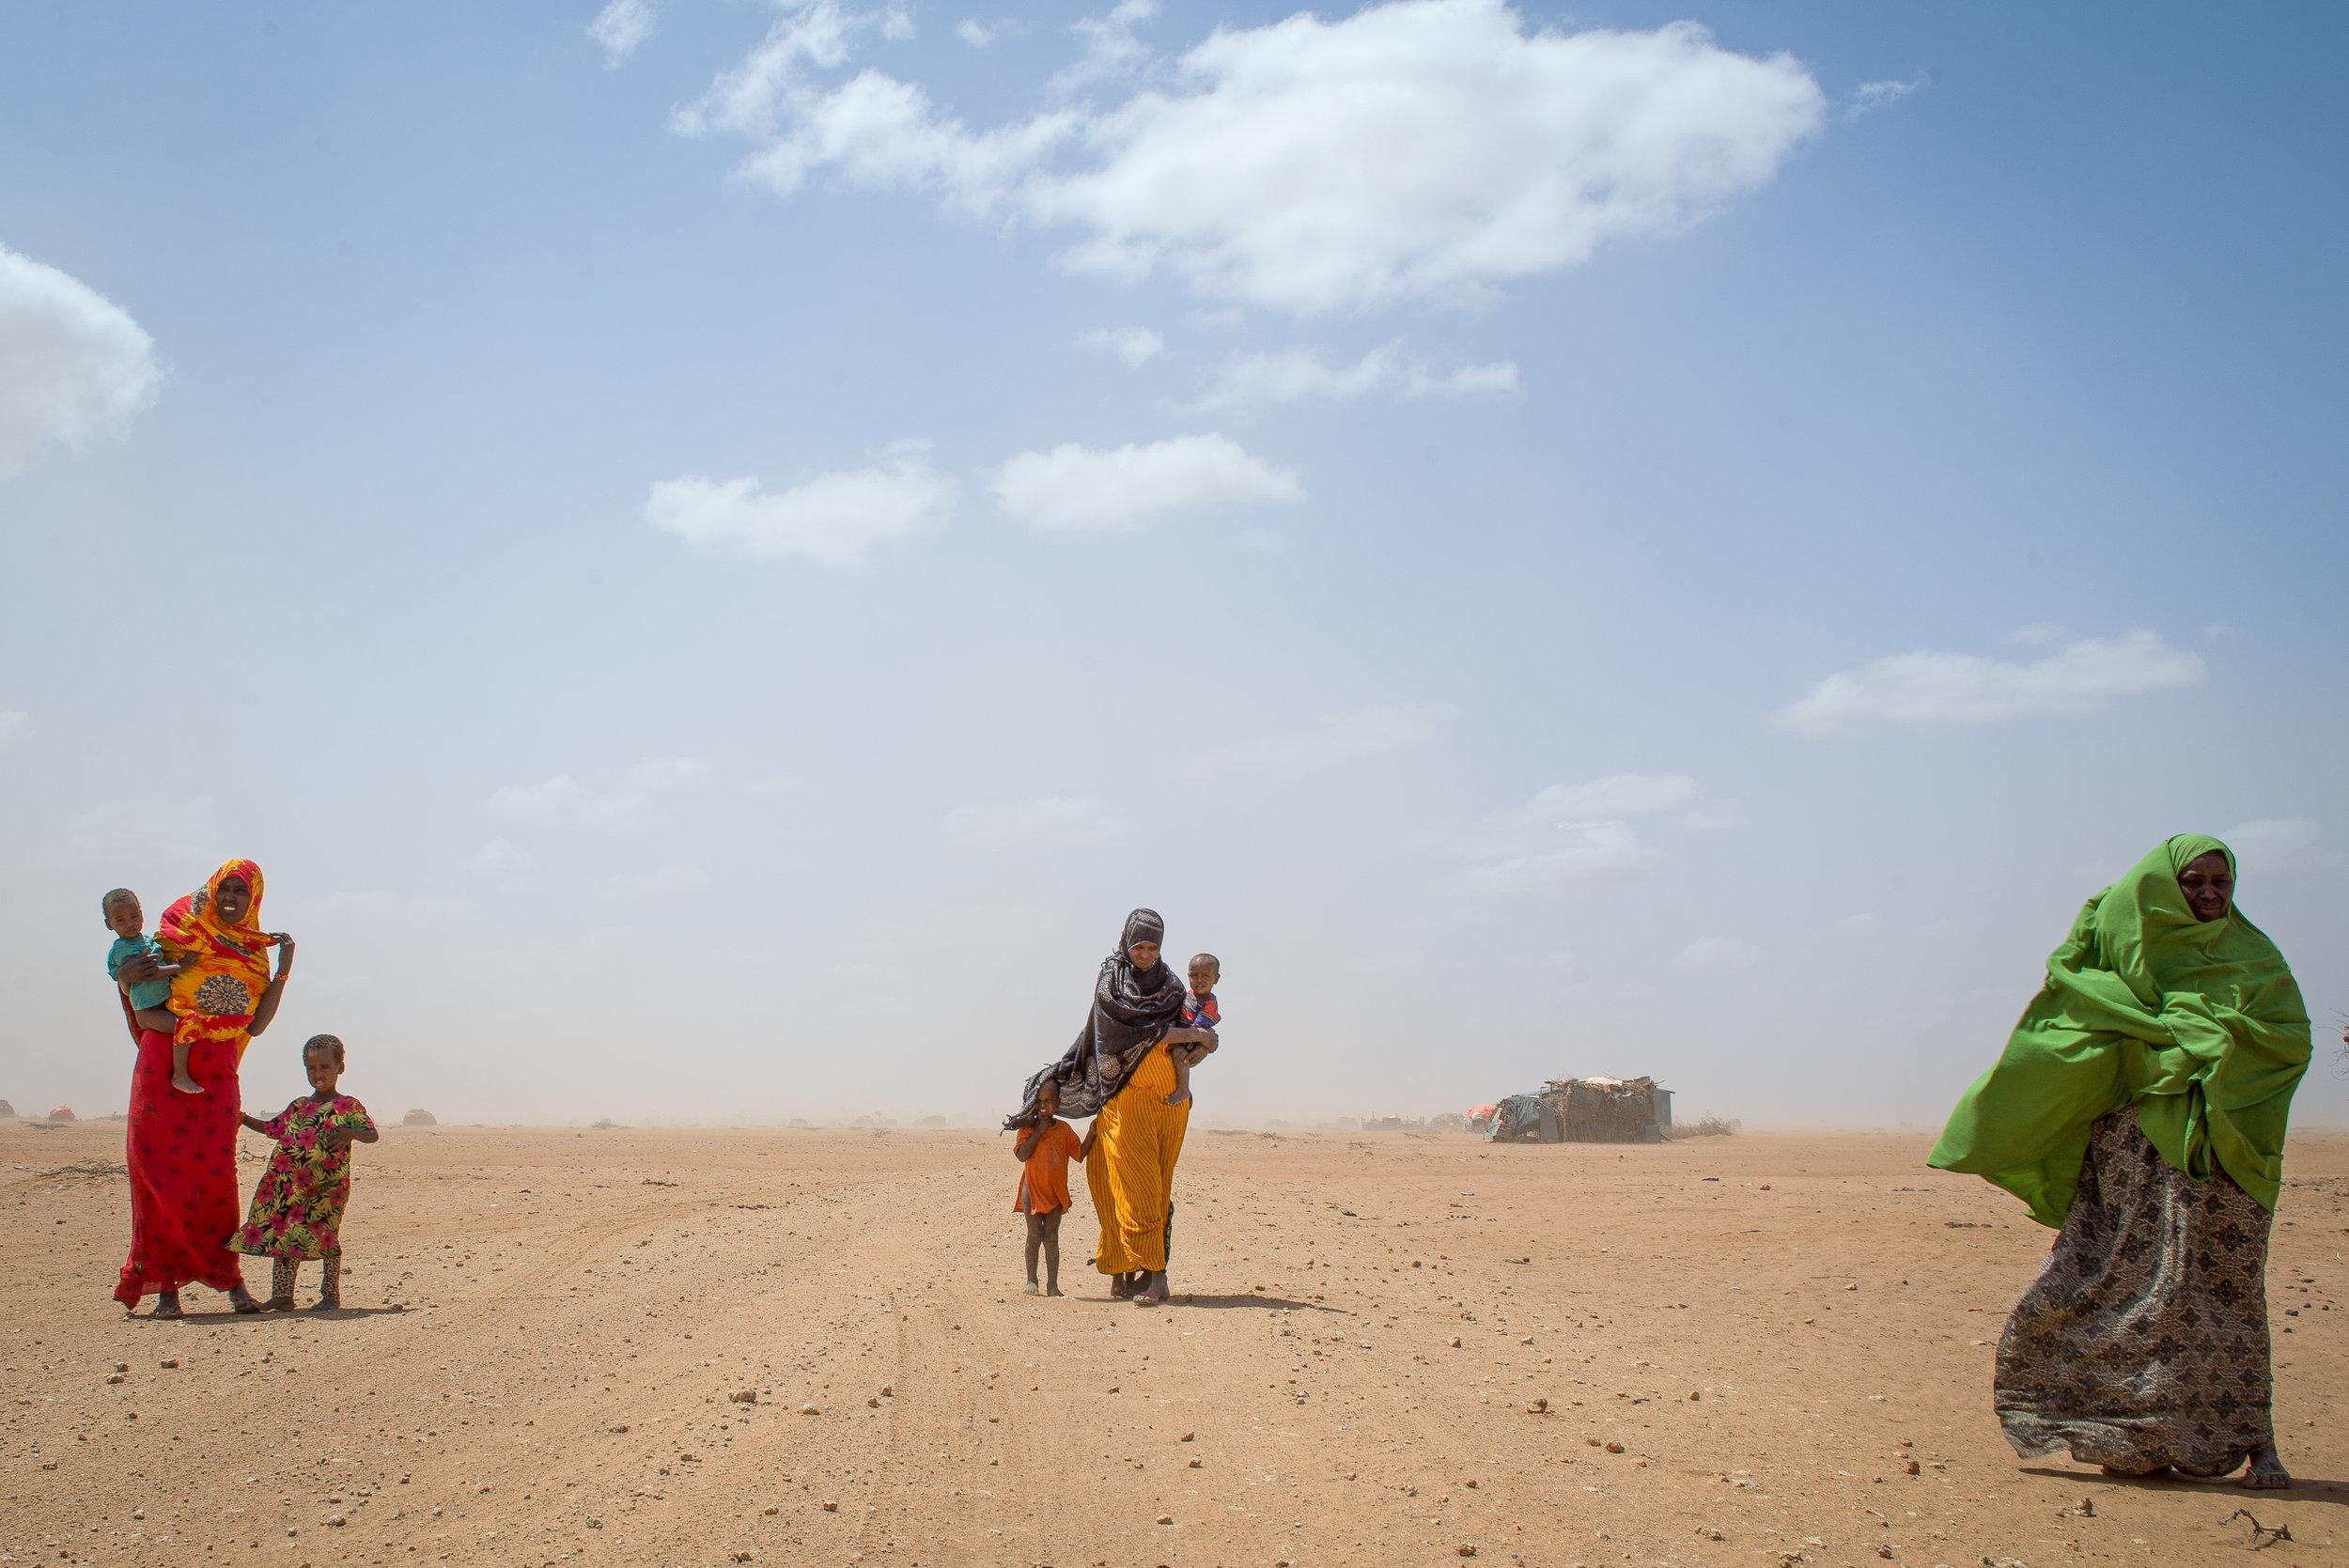 Women carry their children through a sandstorm in a remote village of Wajir County, Kenya. Photo: Katie G. Nelson, Oxfam